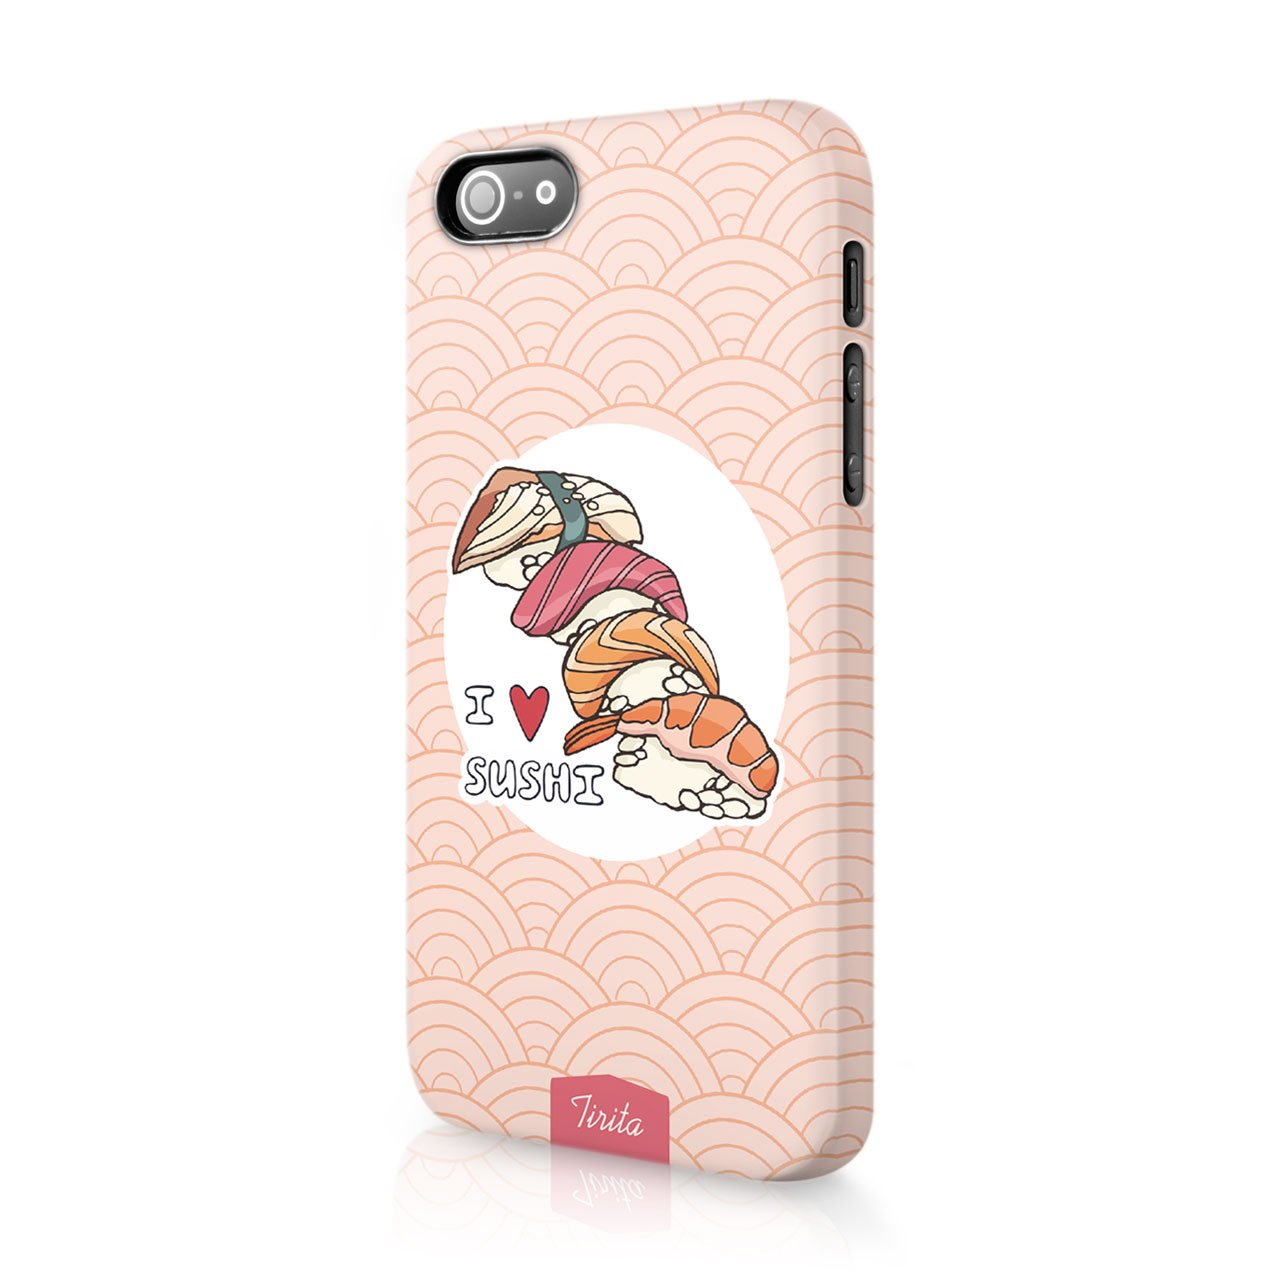 iPhone X&Xs Tiritaハードケースカバー寿司和食日本デザインデザイナー柄   B0788S5PSR